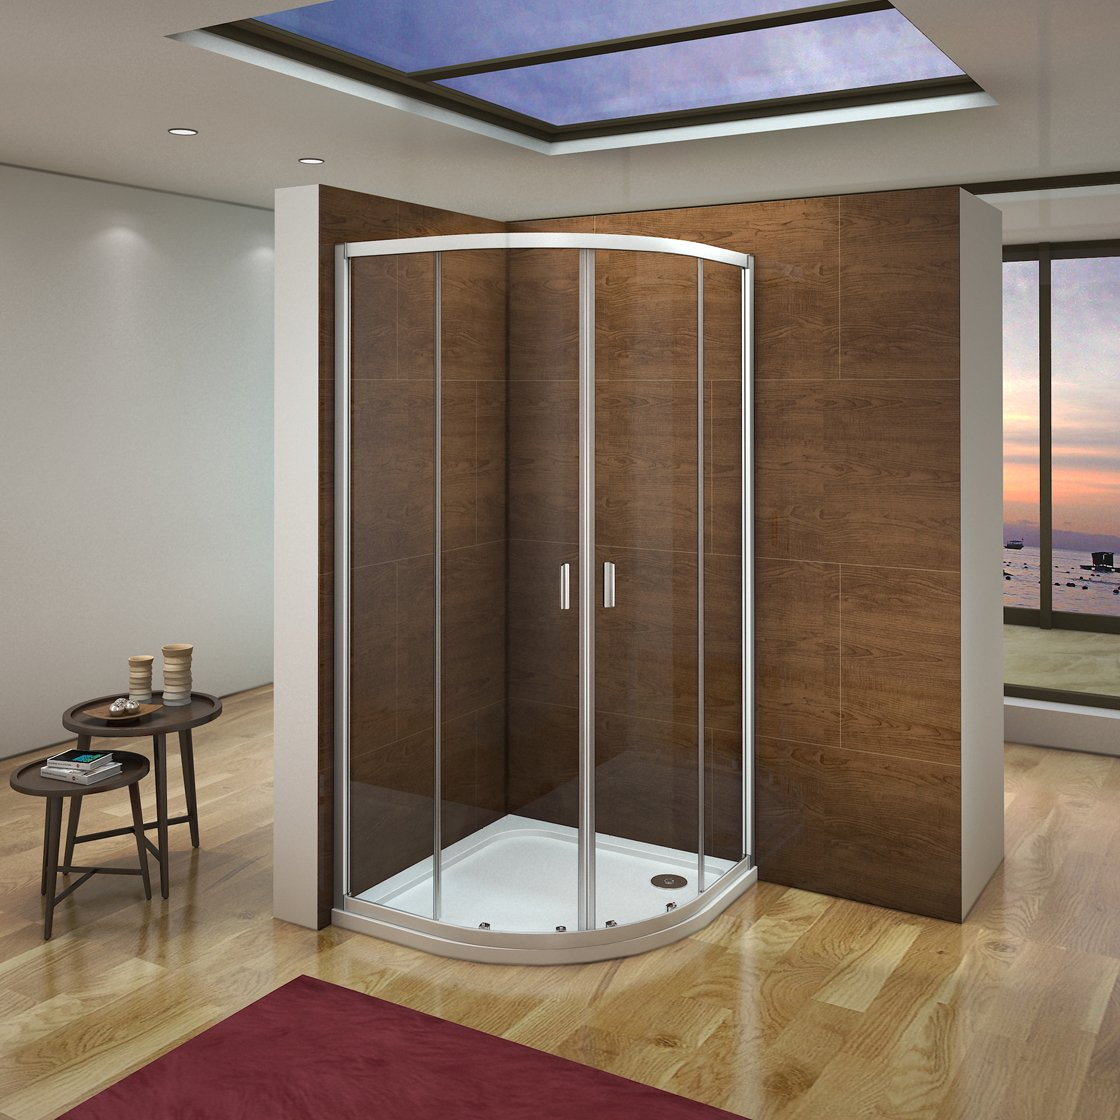 Cabina de ducha semicircular mamparas de ba/ño 6mm vidrio templado 80x80cm